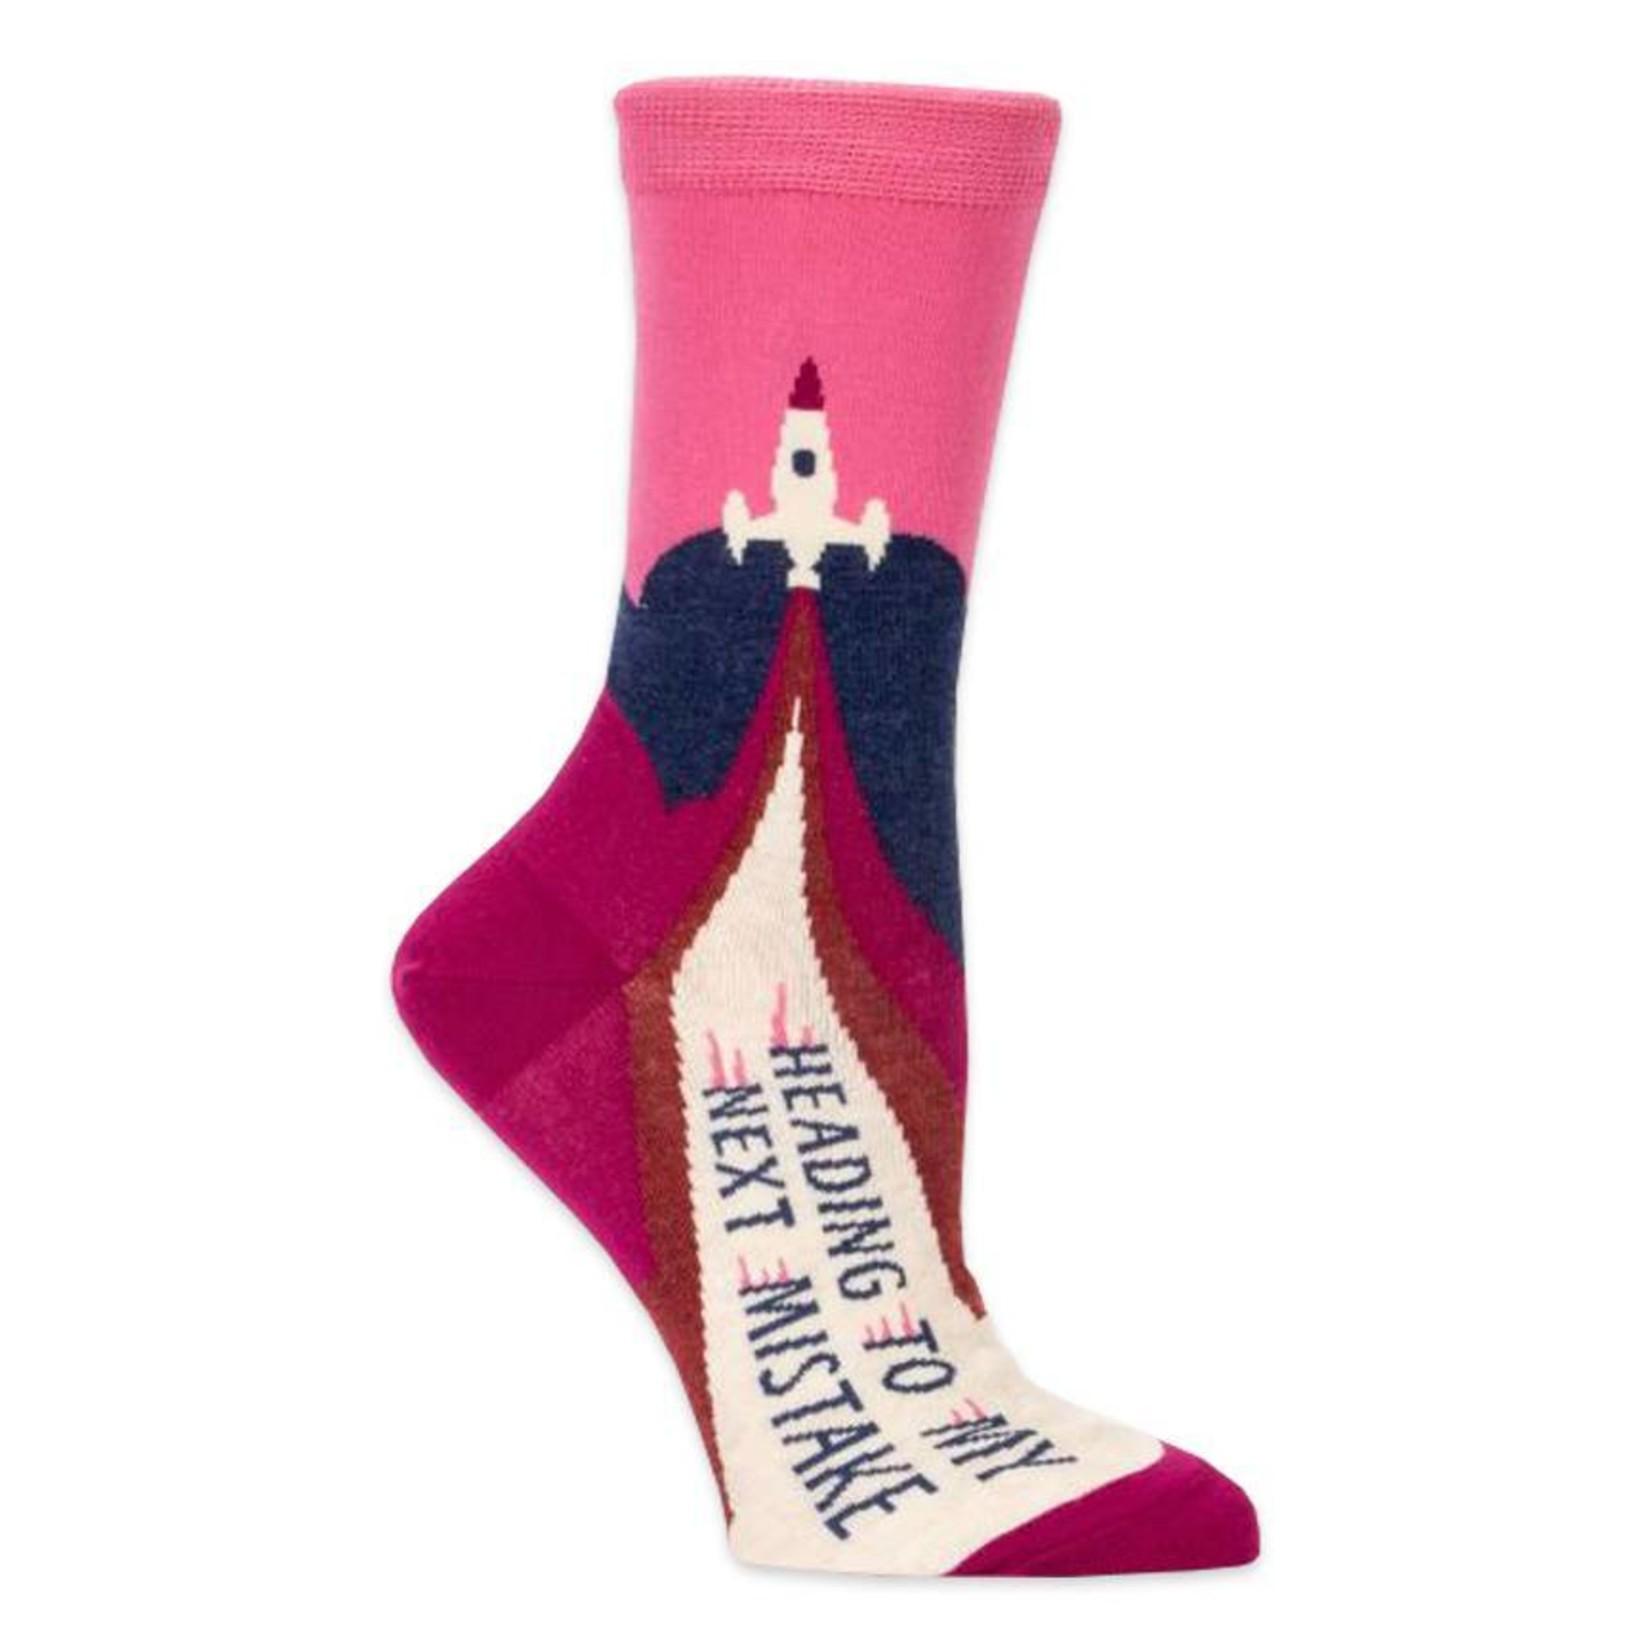 Blue Q Womens Crew Socks - Heading to My Next Mistake